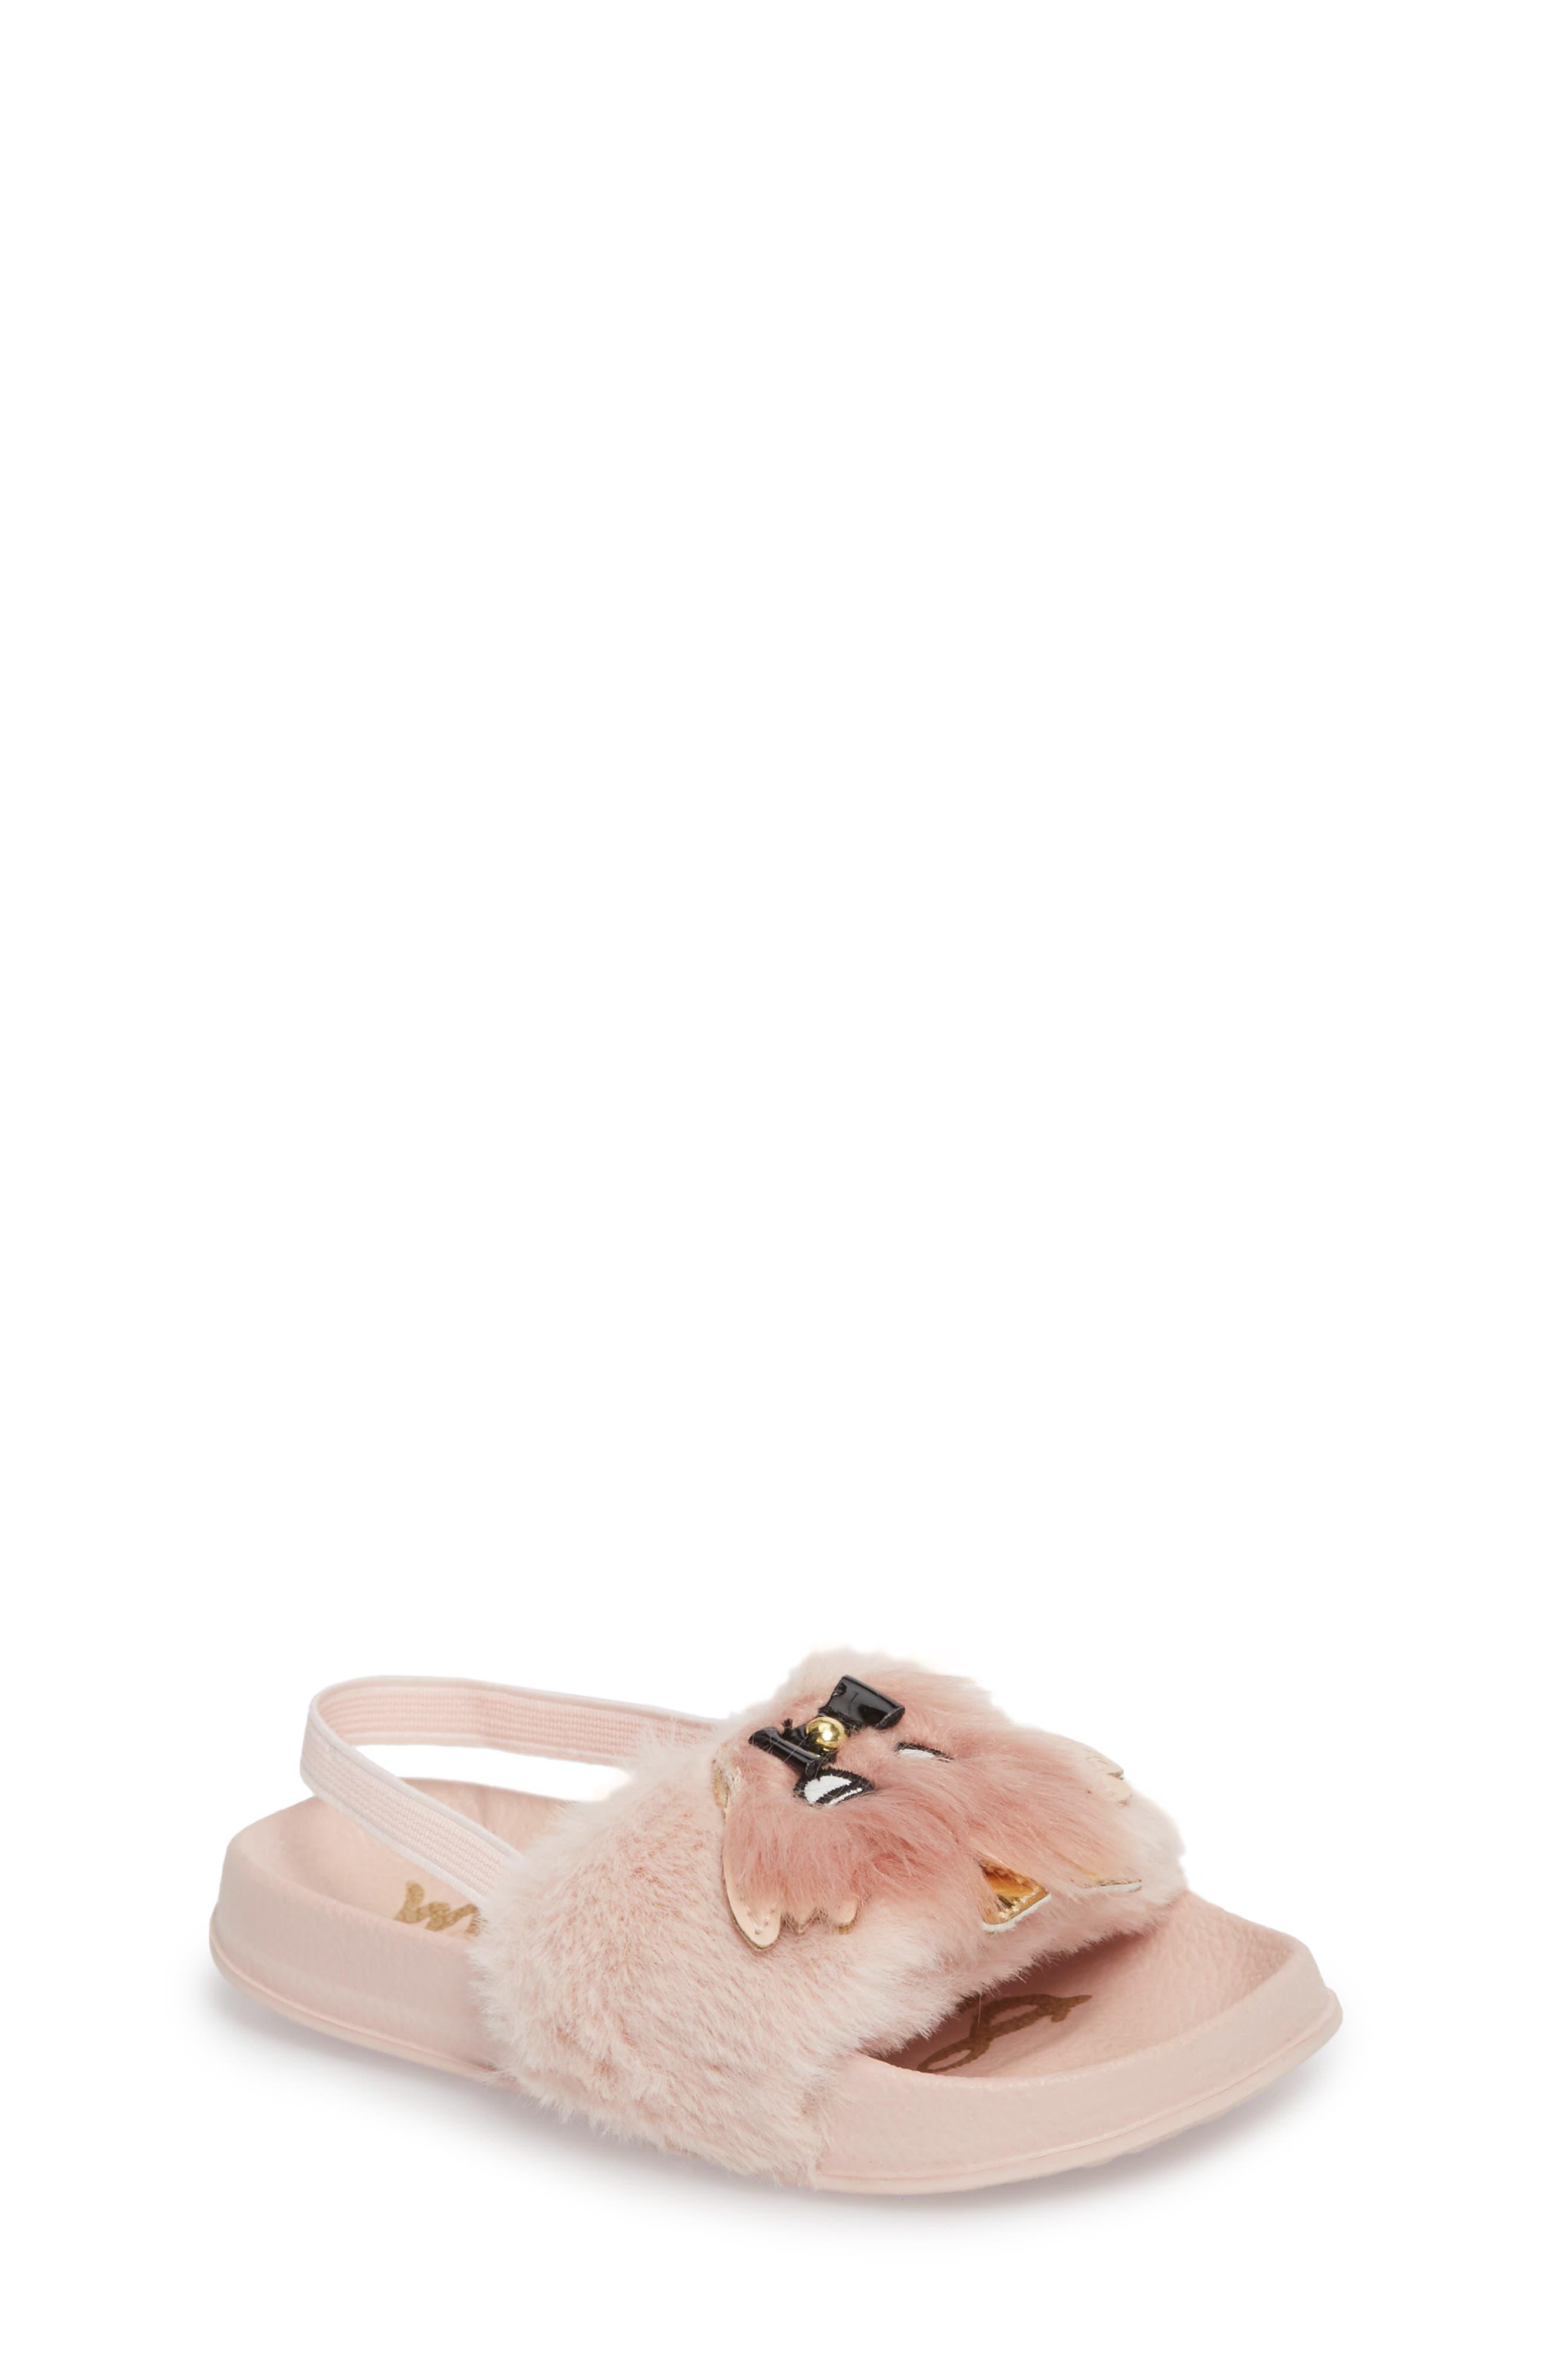 Mackie Faux Fur Sandal,                             Main thumbnail 1, color,                             654